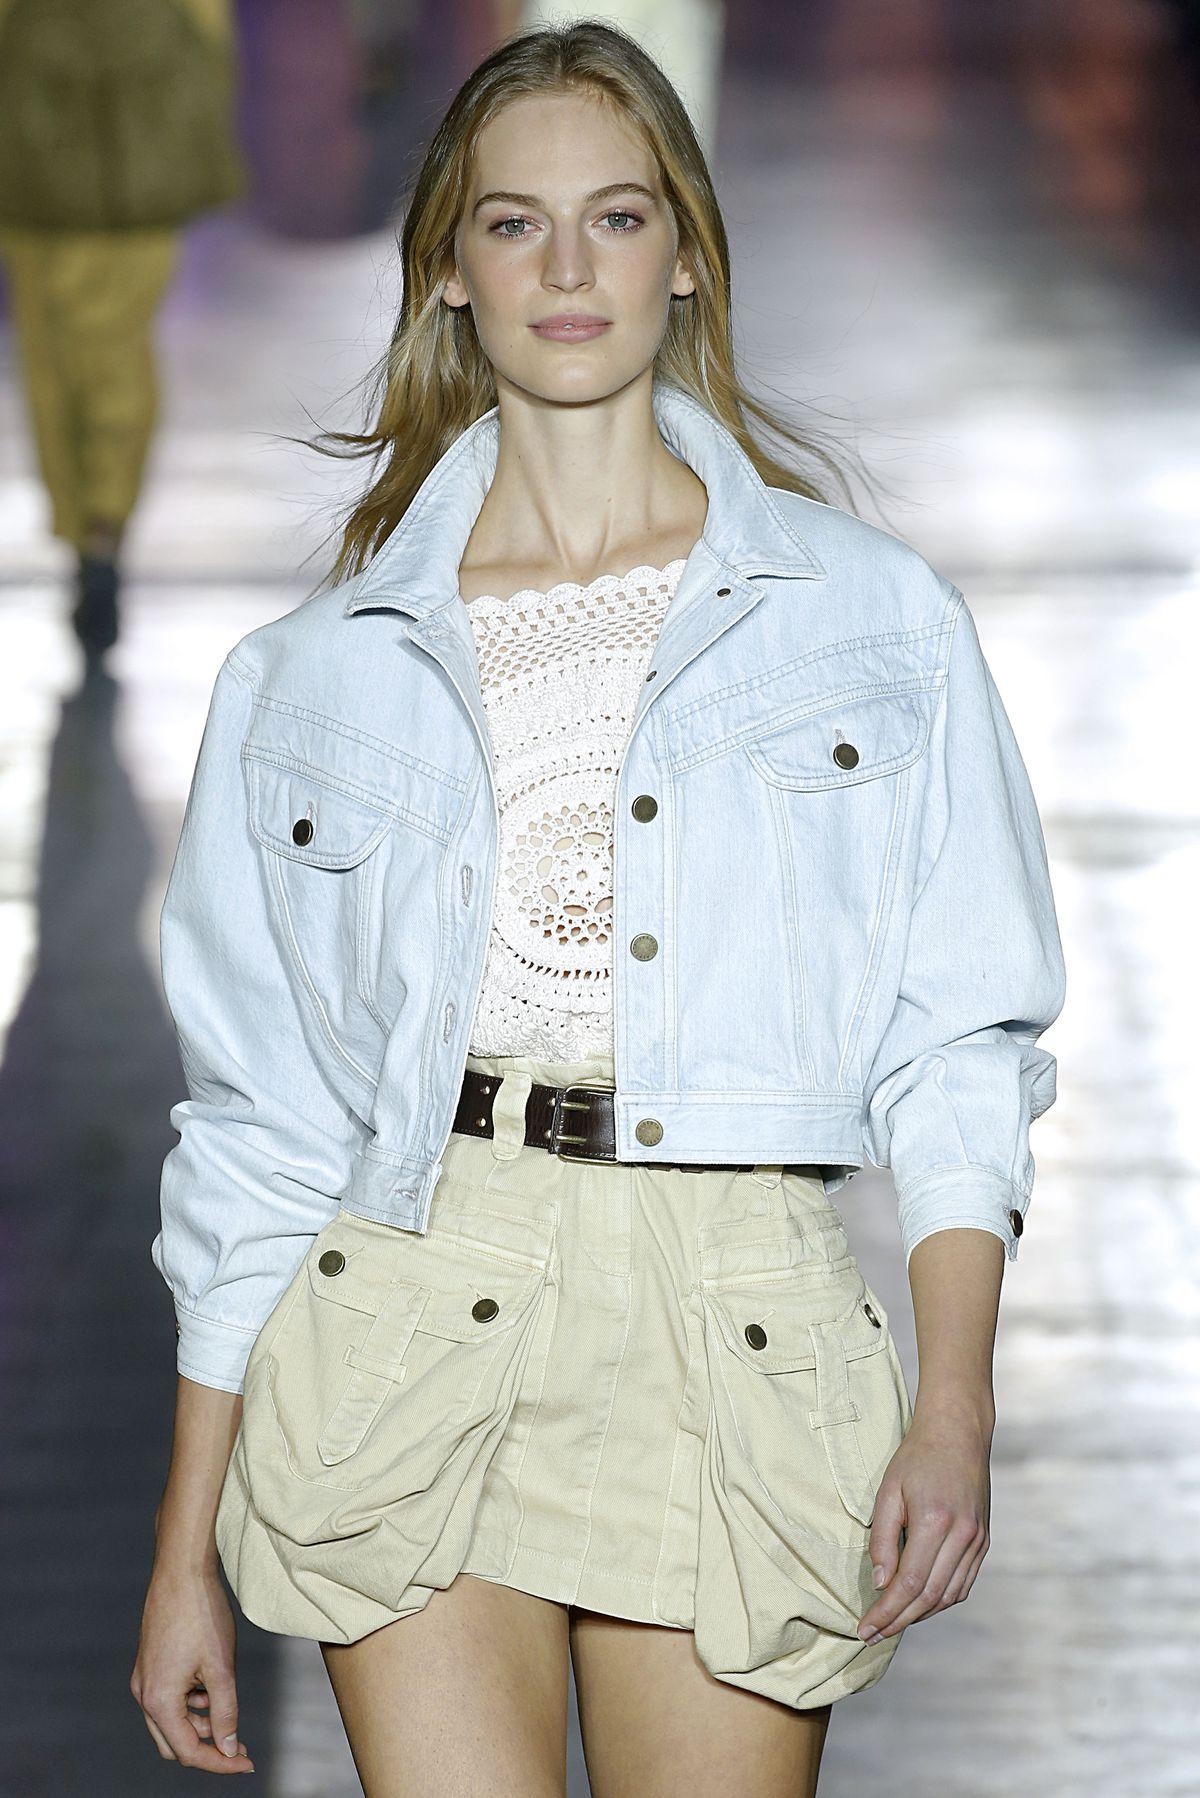 A model walks the runway wearing a miniskirt with mondo pockets.